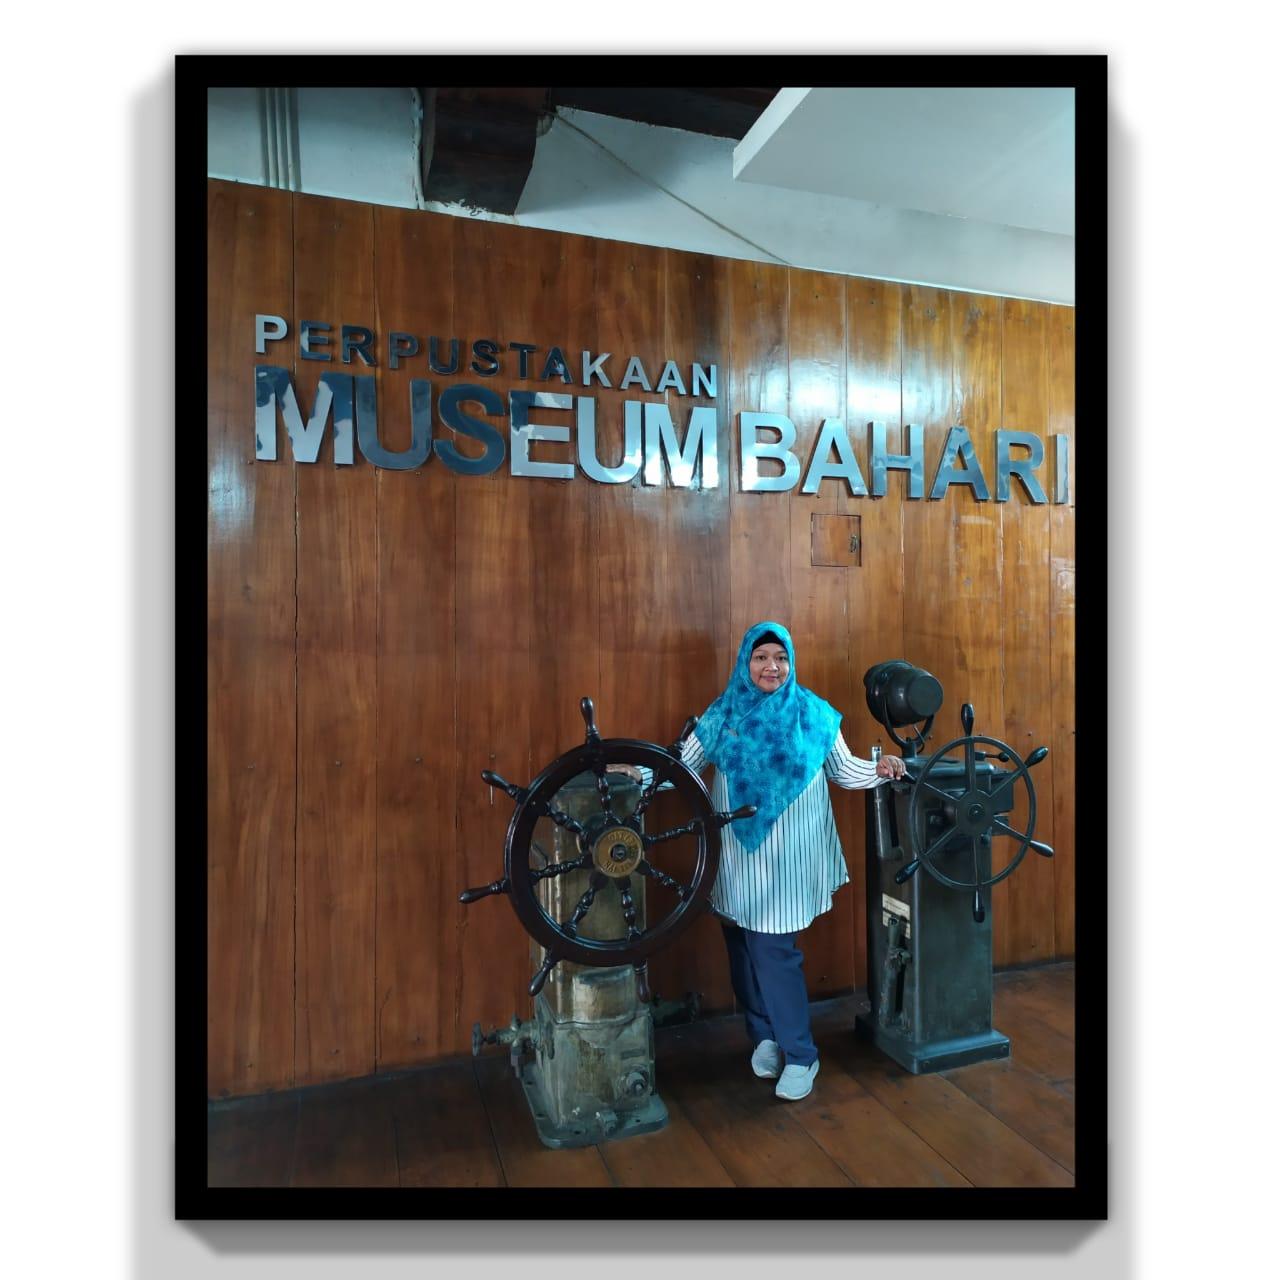 mengenal sejarah maritim Indonesia